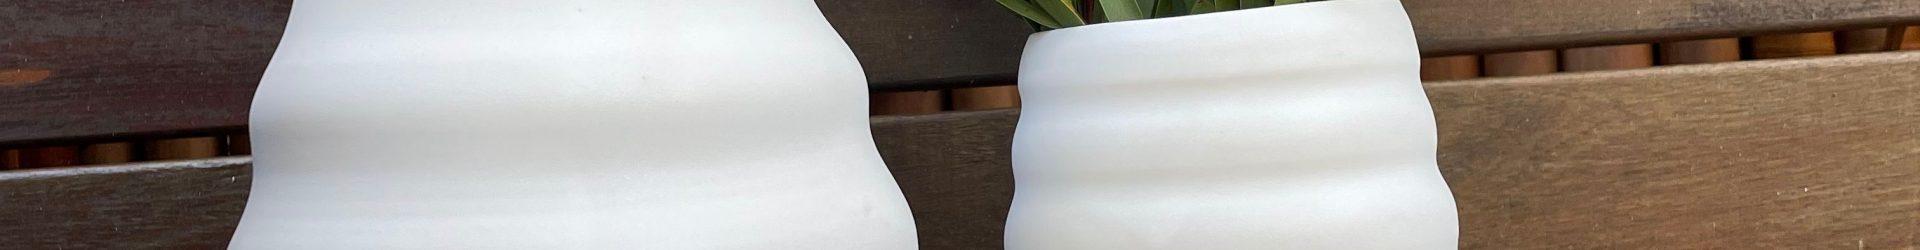 Small Soft Serve Vase